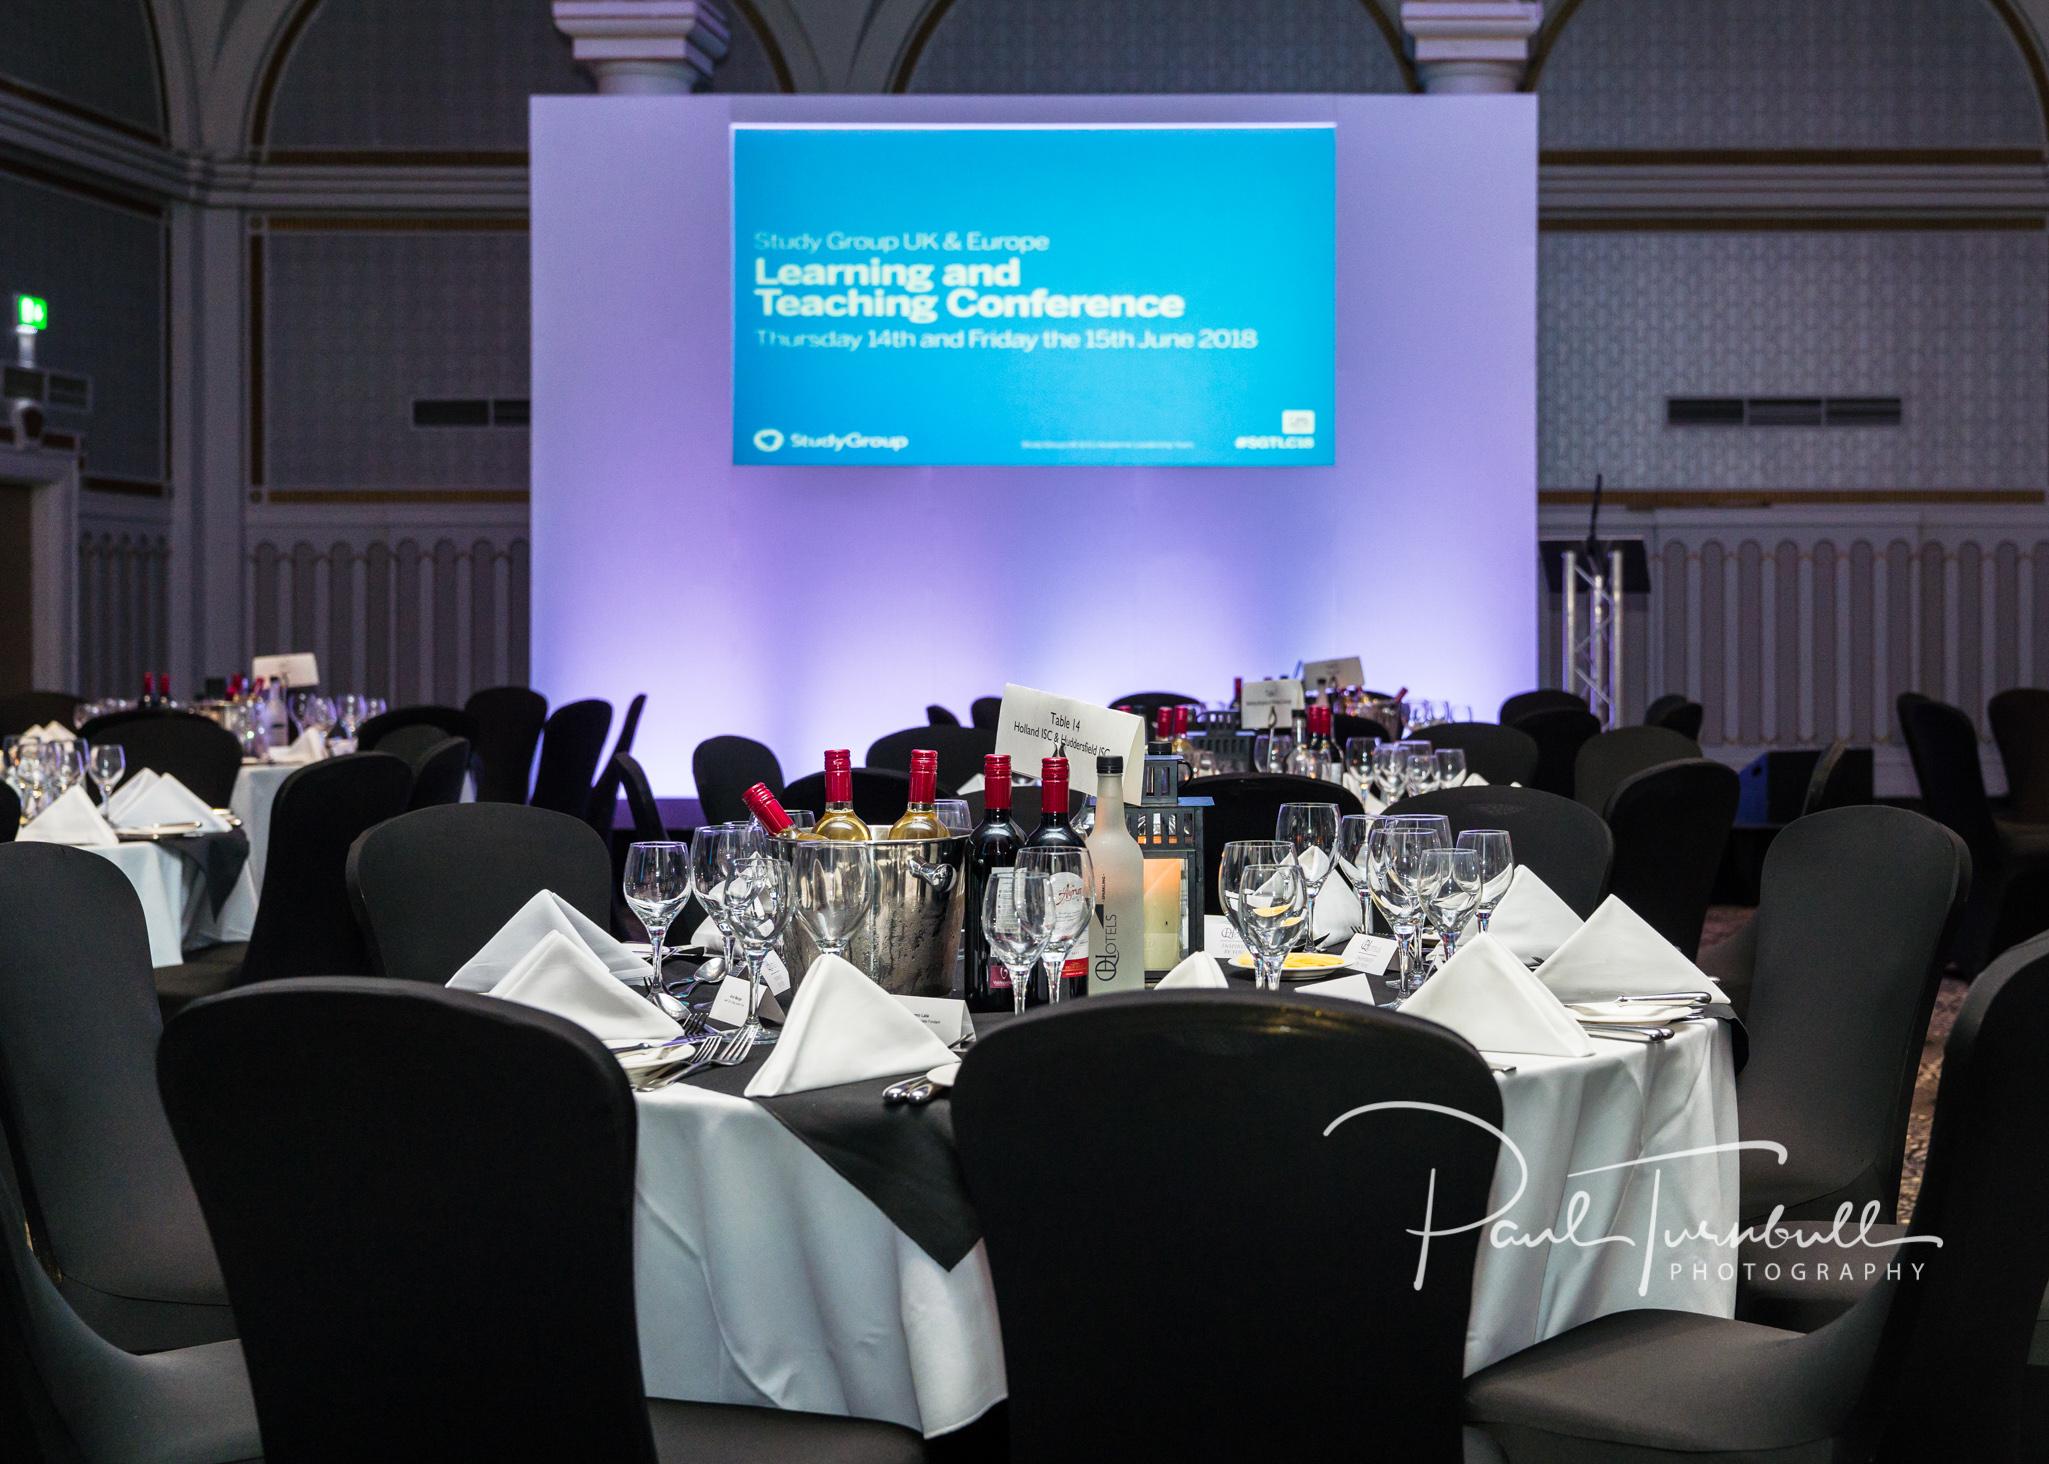 conference-event-photographer-queens-hotel-leeds-yorkshire-005.jpg